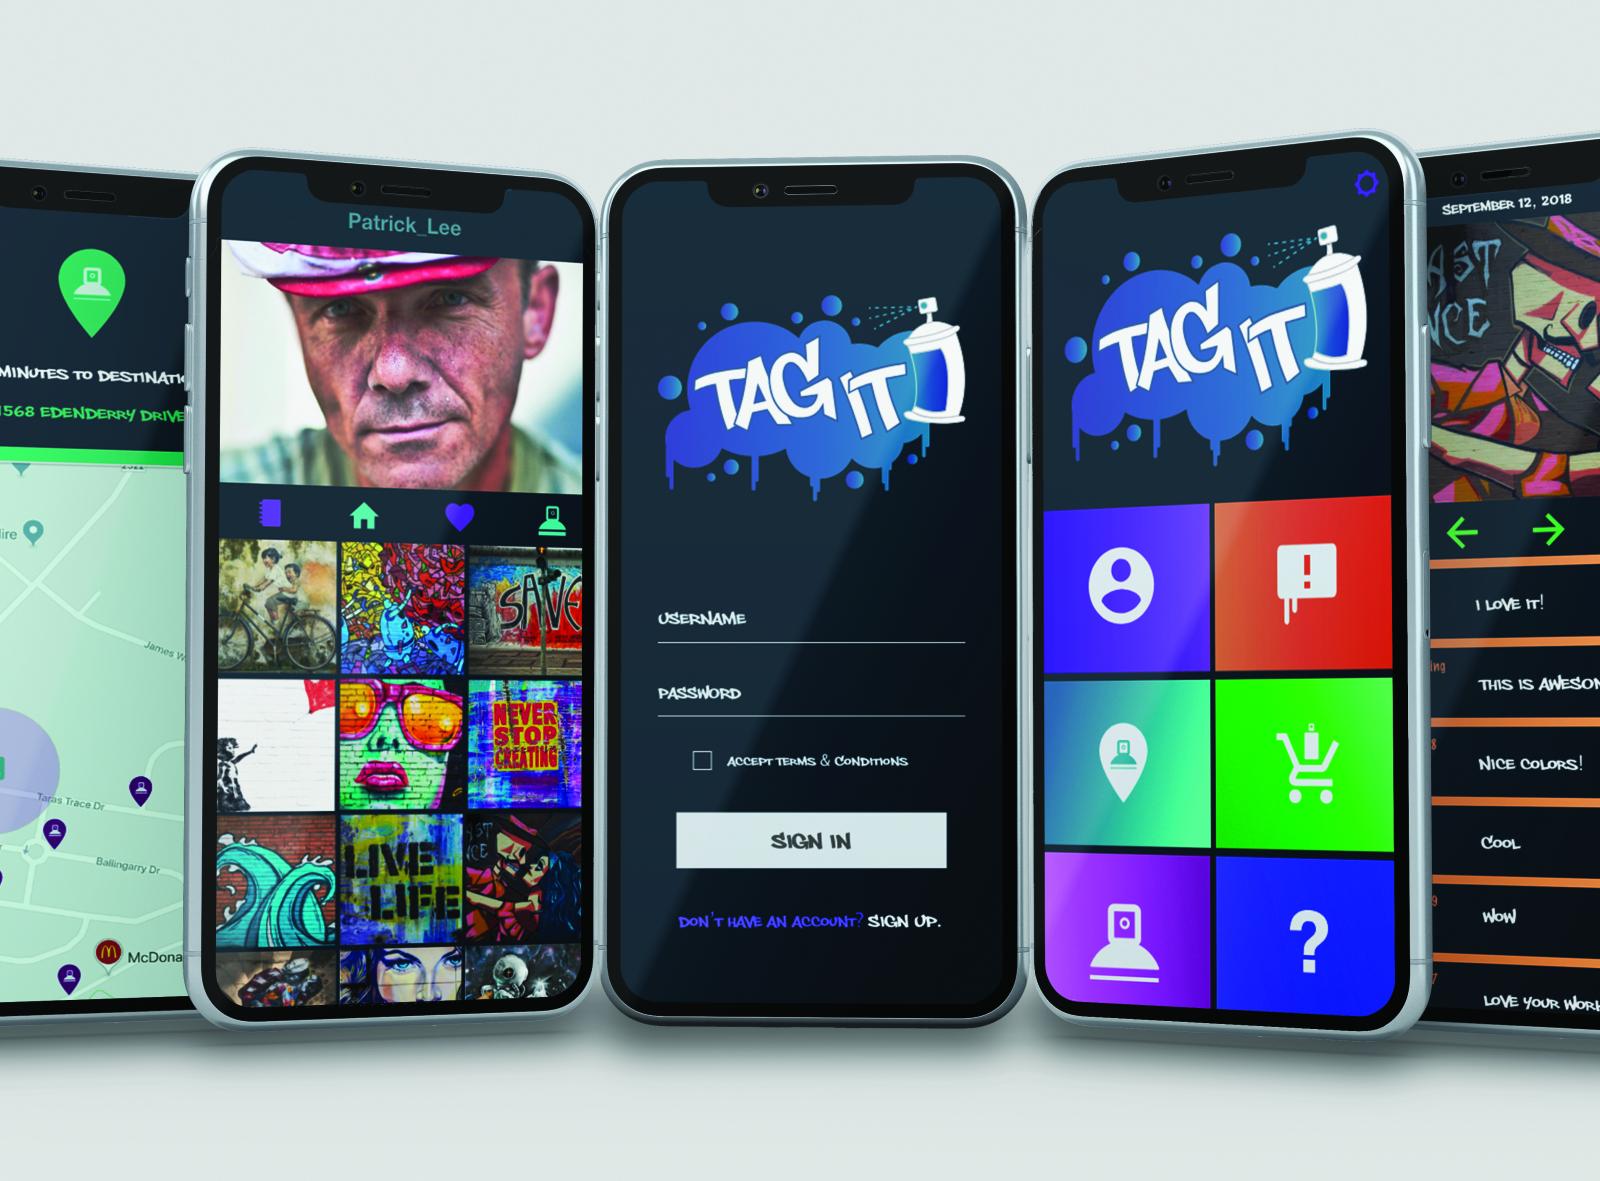 Tagit App Mockup By Cynthia Lainez On Dribbble